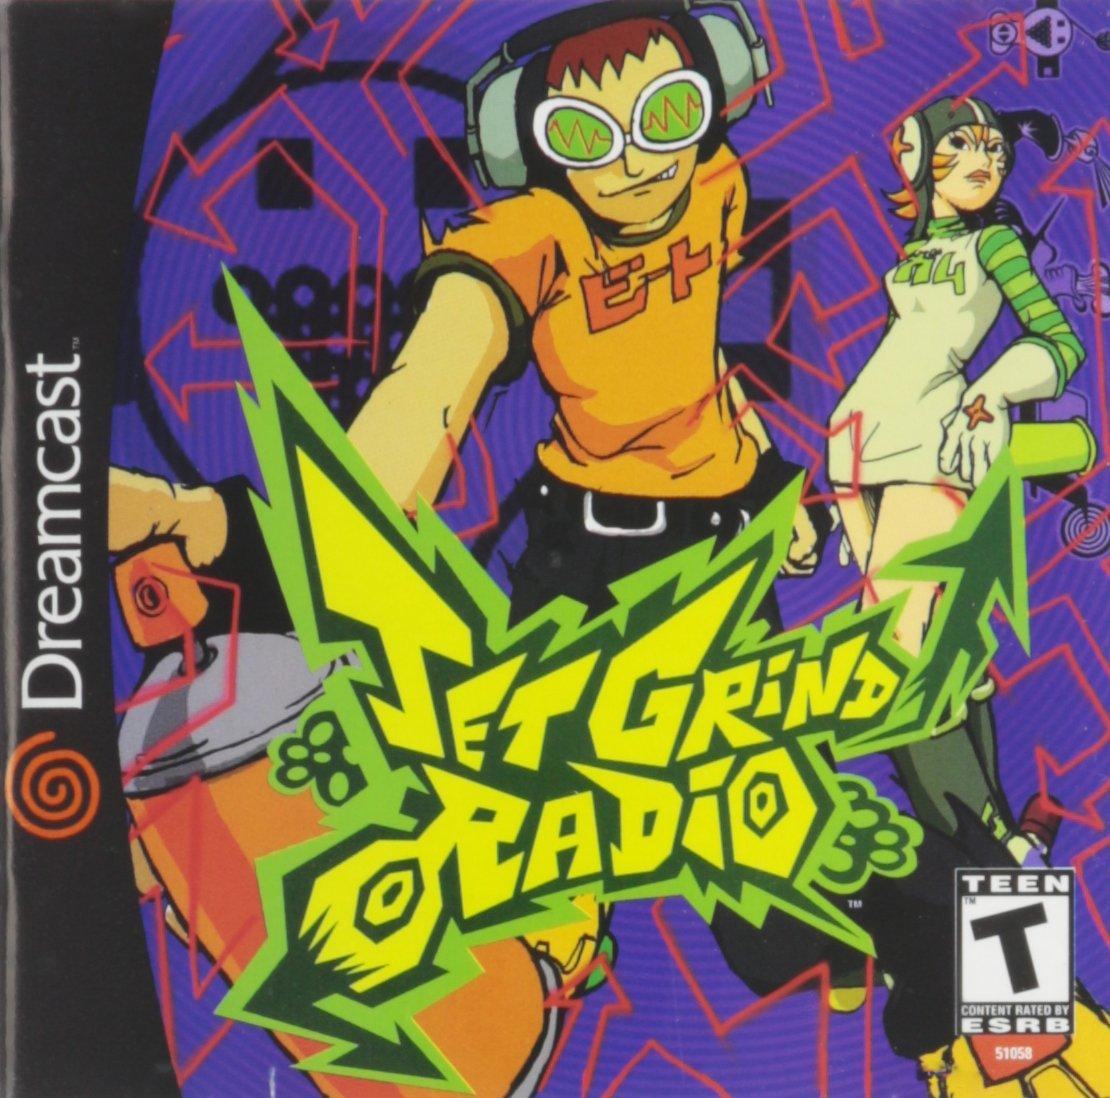 Jet Grind Radio by Sega (Image #1)